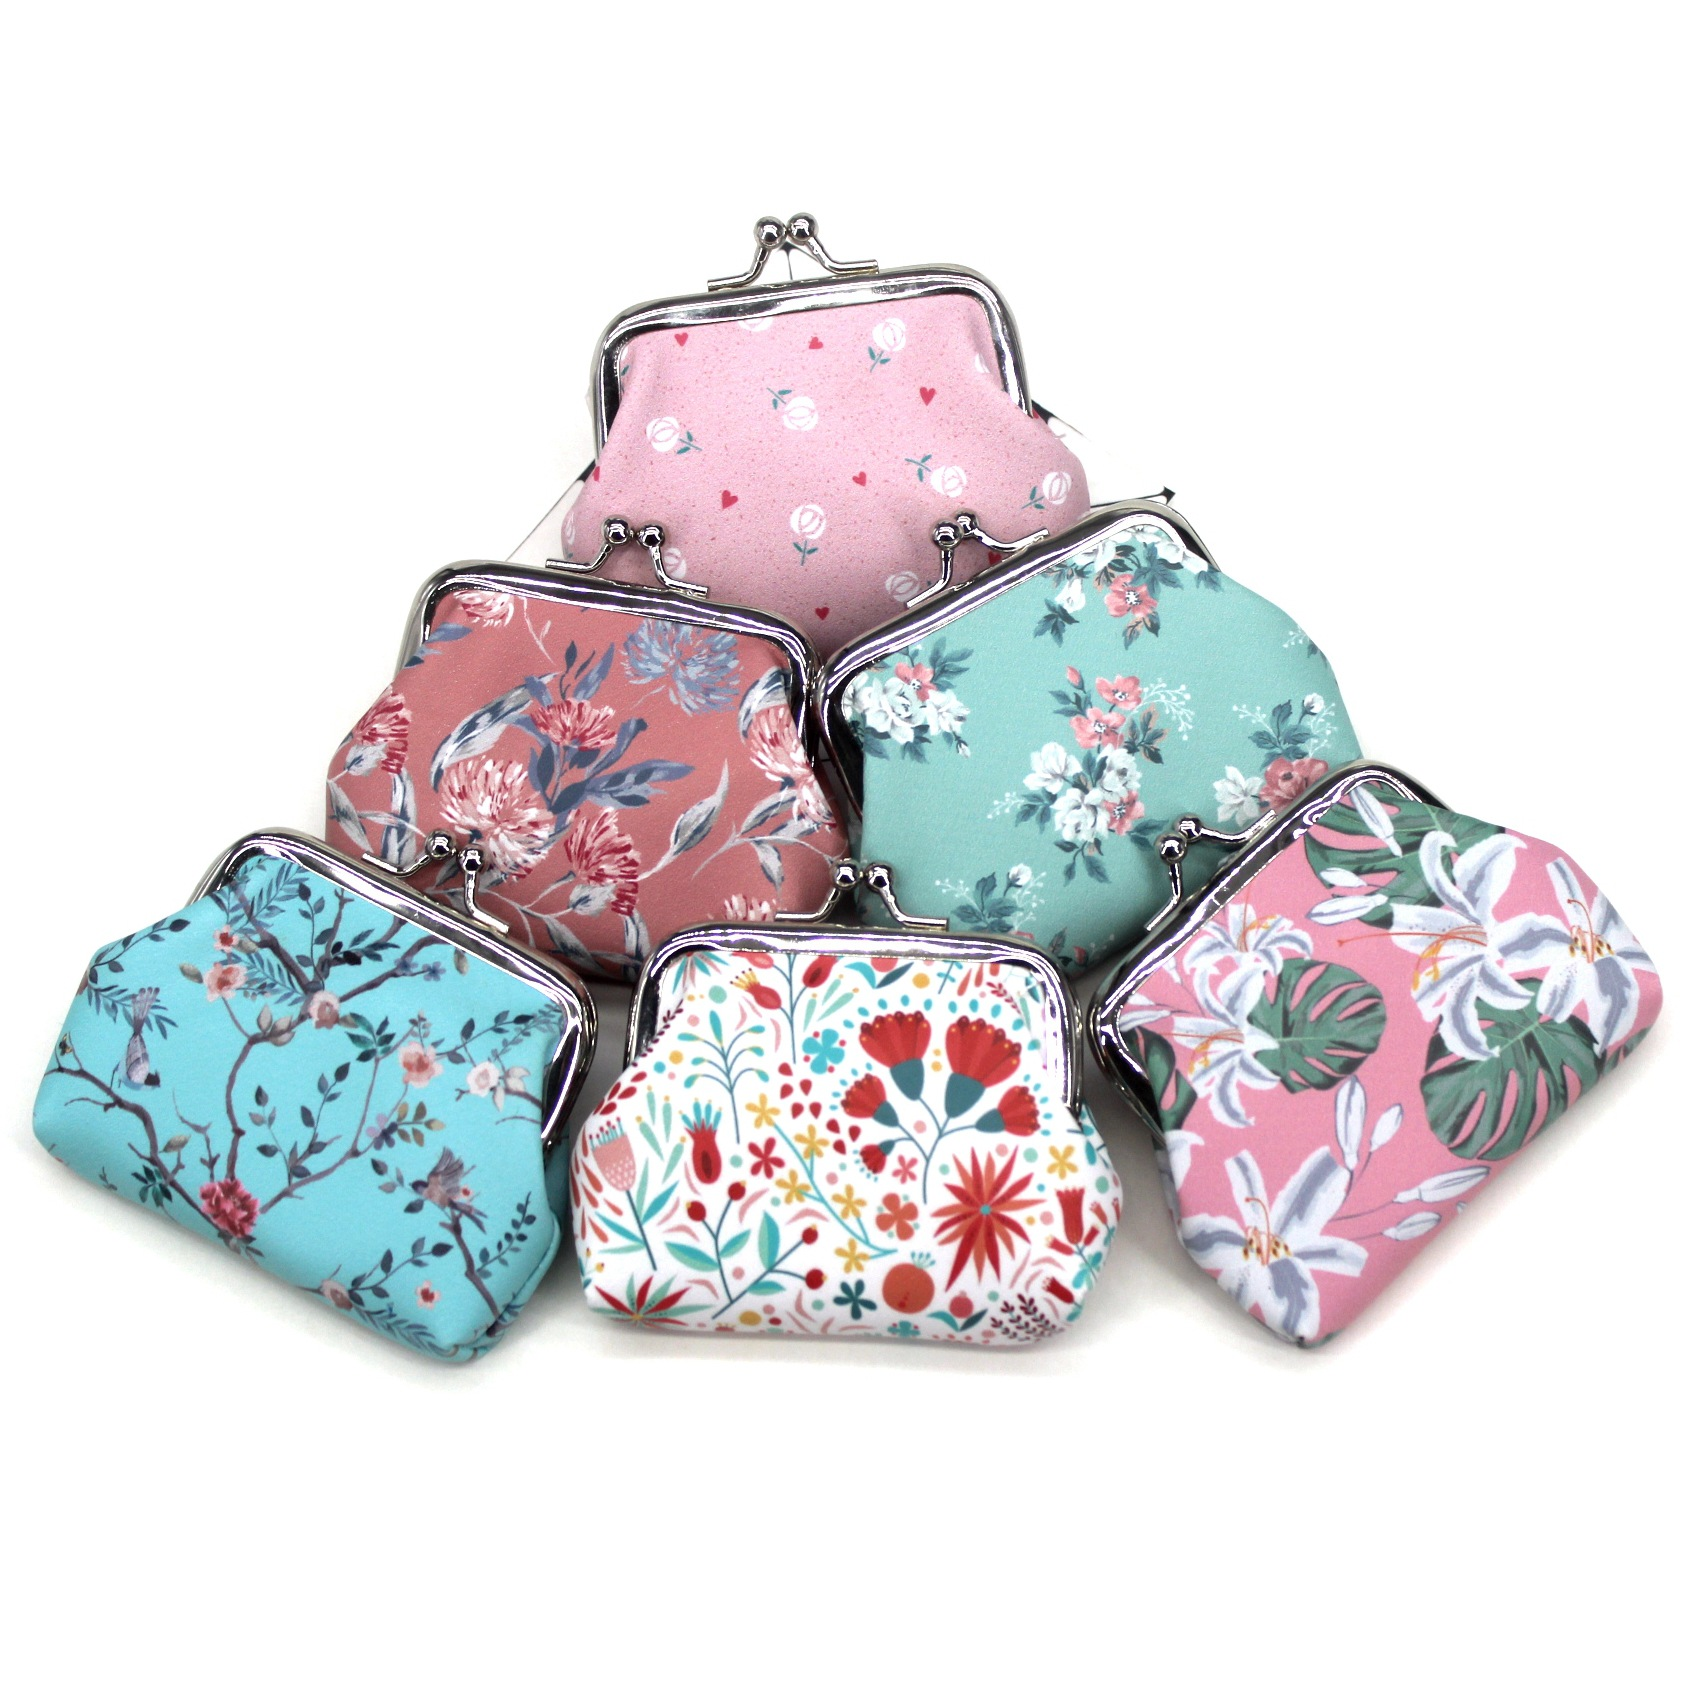 Girls Coin Purses Women Printing Mini Wallets Kids Cute Hasp Money Bag Ladies Clutch Change Purse Children Pouch Female Carteira